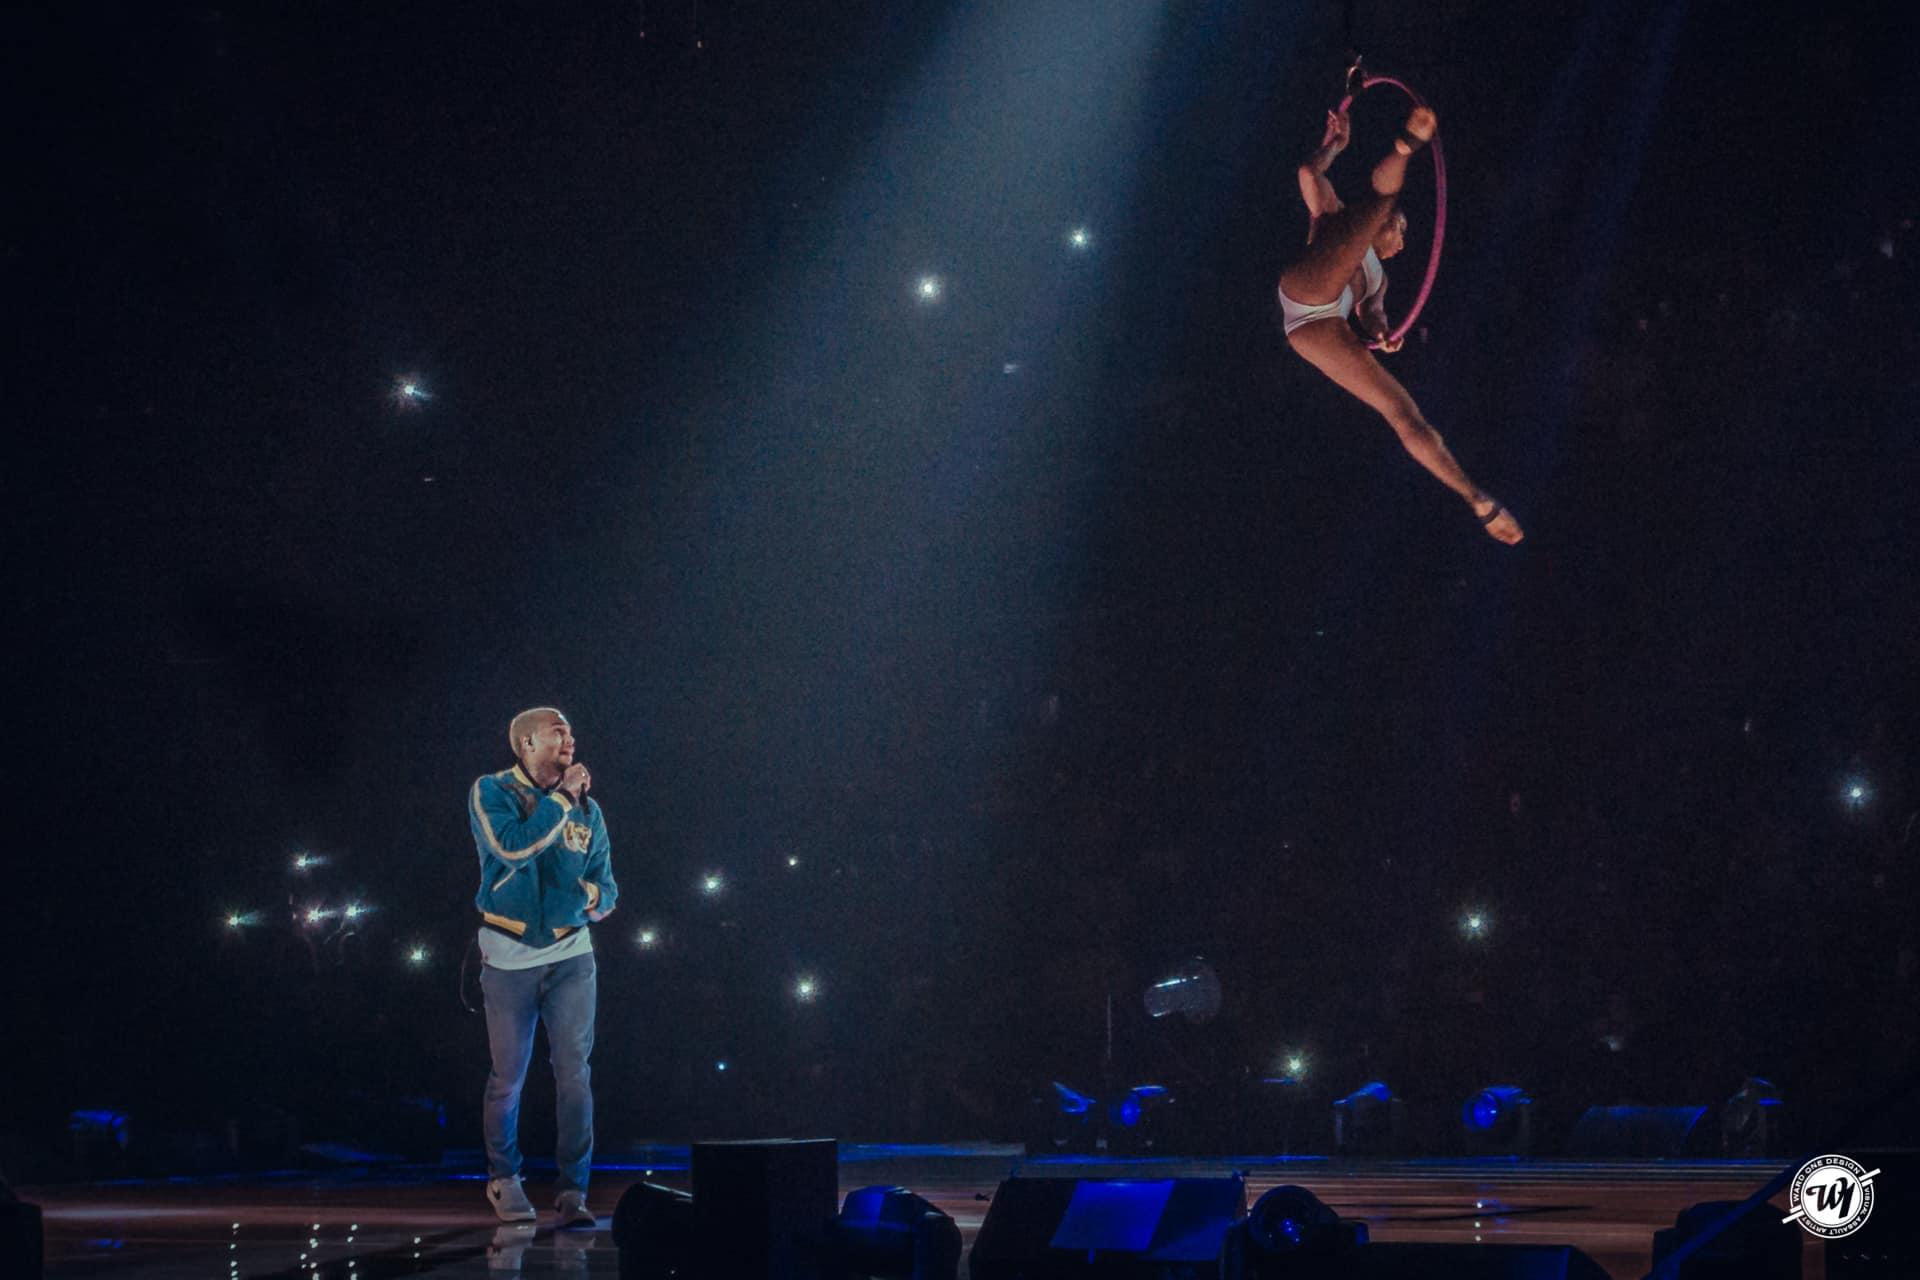 Chris Brown • The Party Tour • Chicago Concerts Ward 1 Design